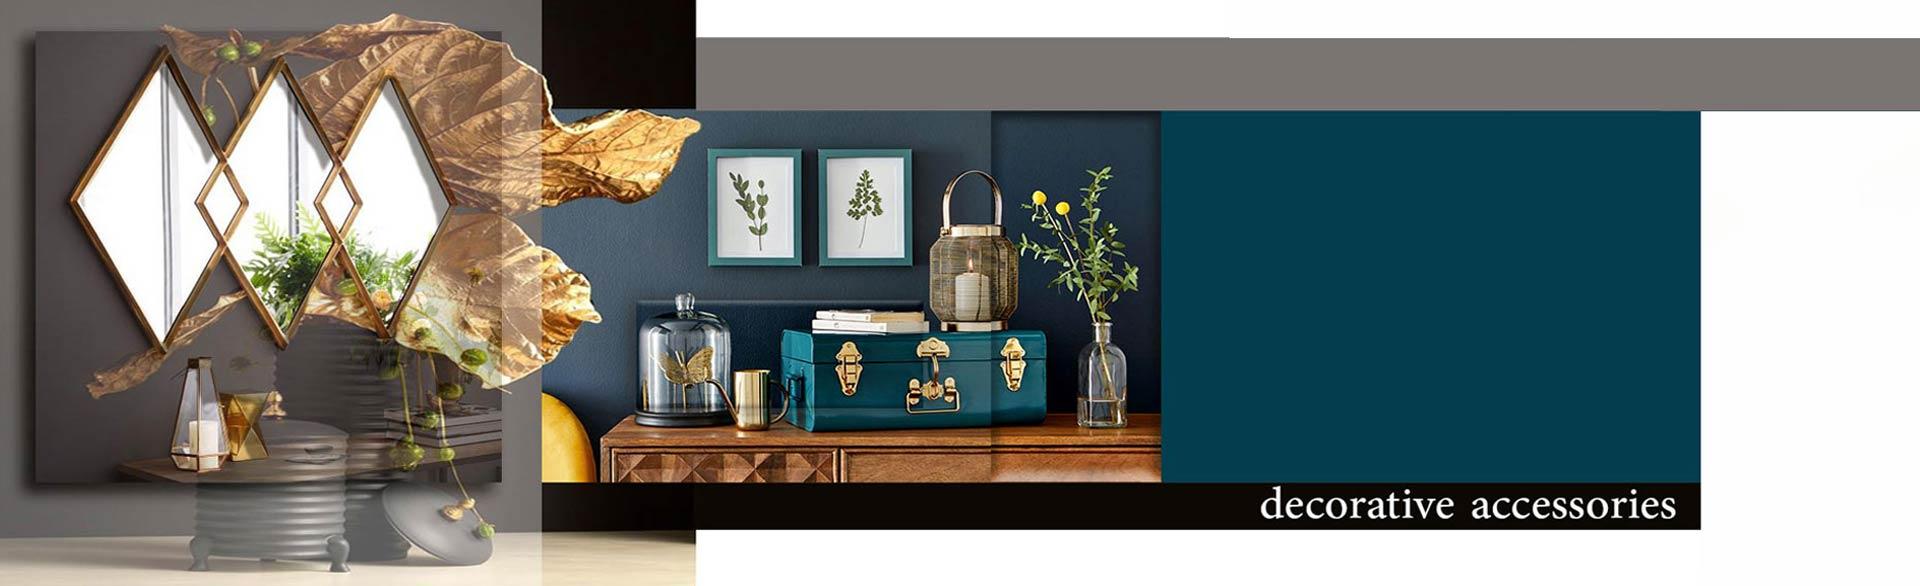 What are decorative  accessories 0 - لوازم دکوری چه چیزهایی هستند؟